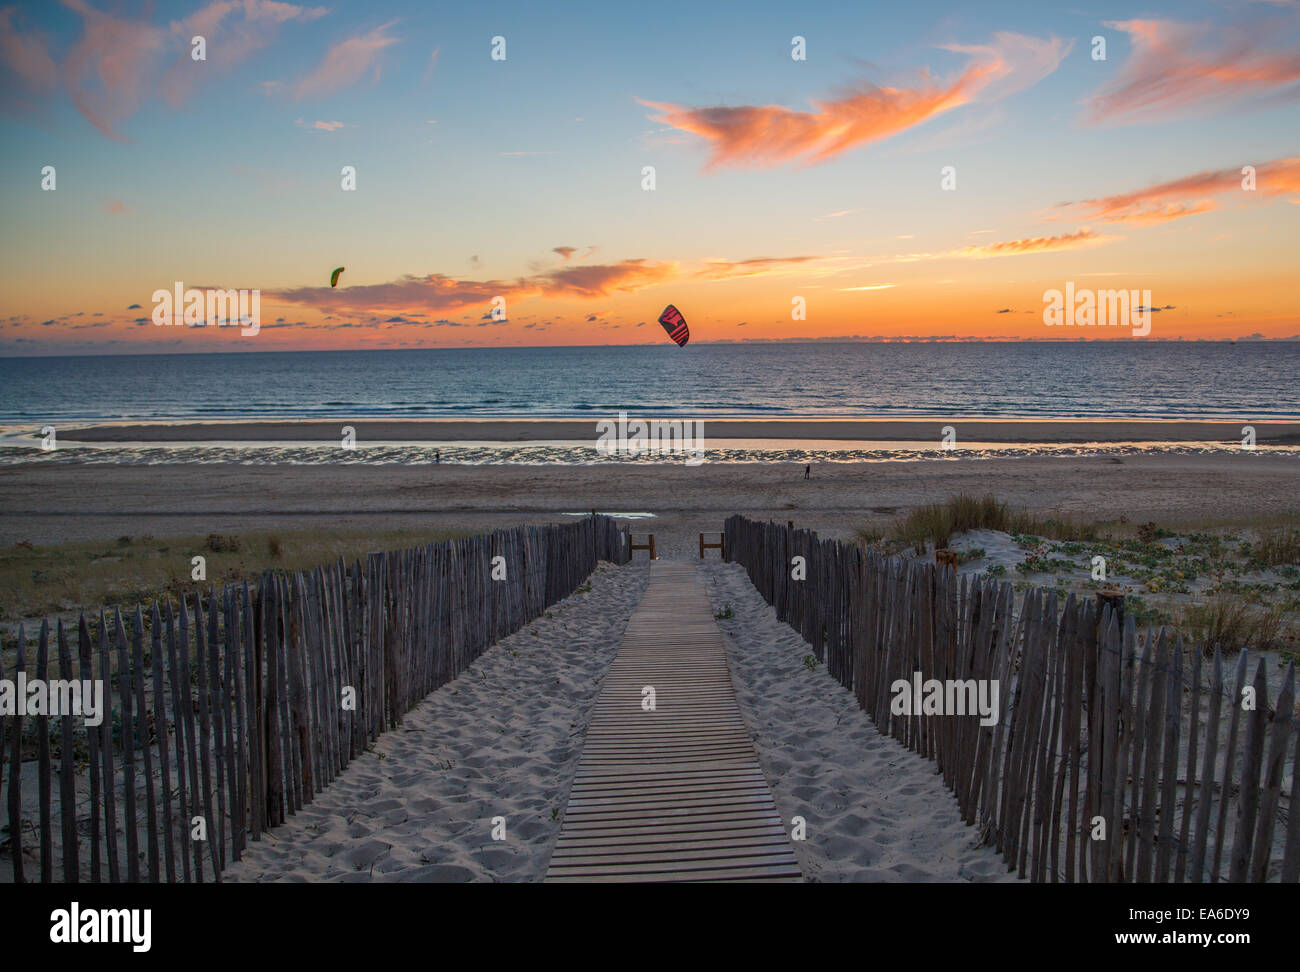 France, Aquitane, Mont-de-Marsan, Beach path - Stock Image